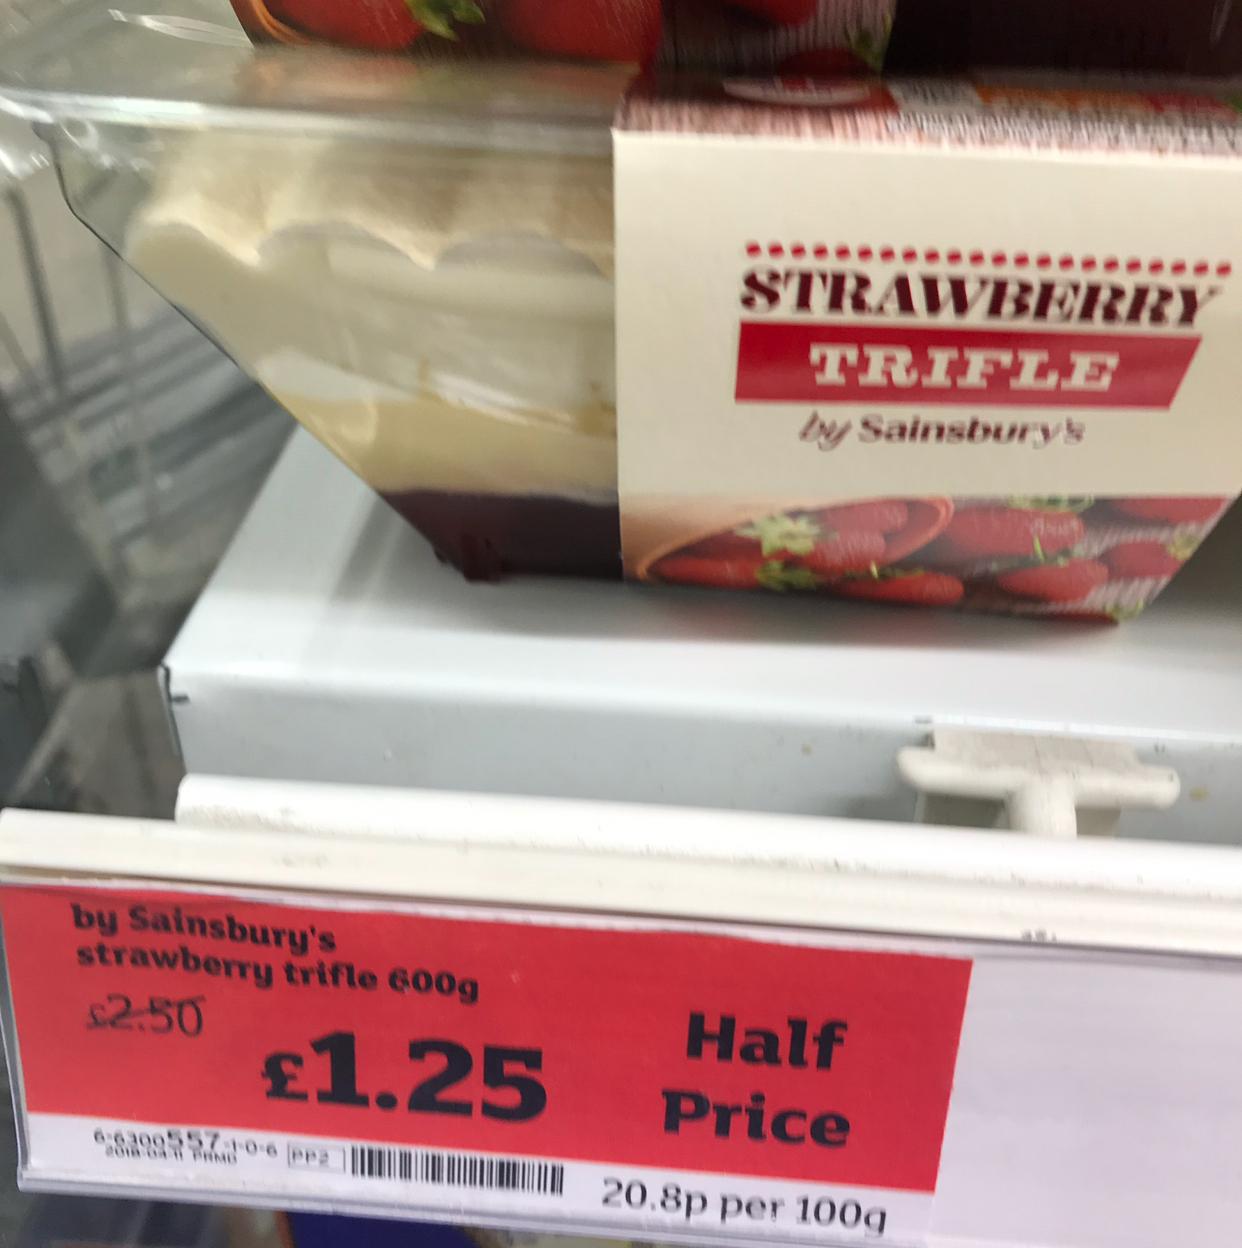 Sainsburys Strawberry Trifle 600g £1.25 (half price again)